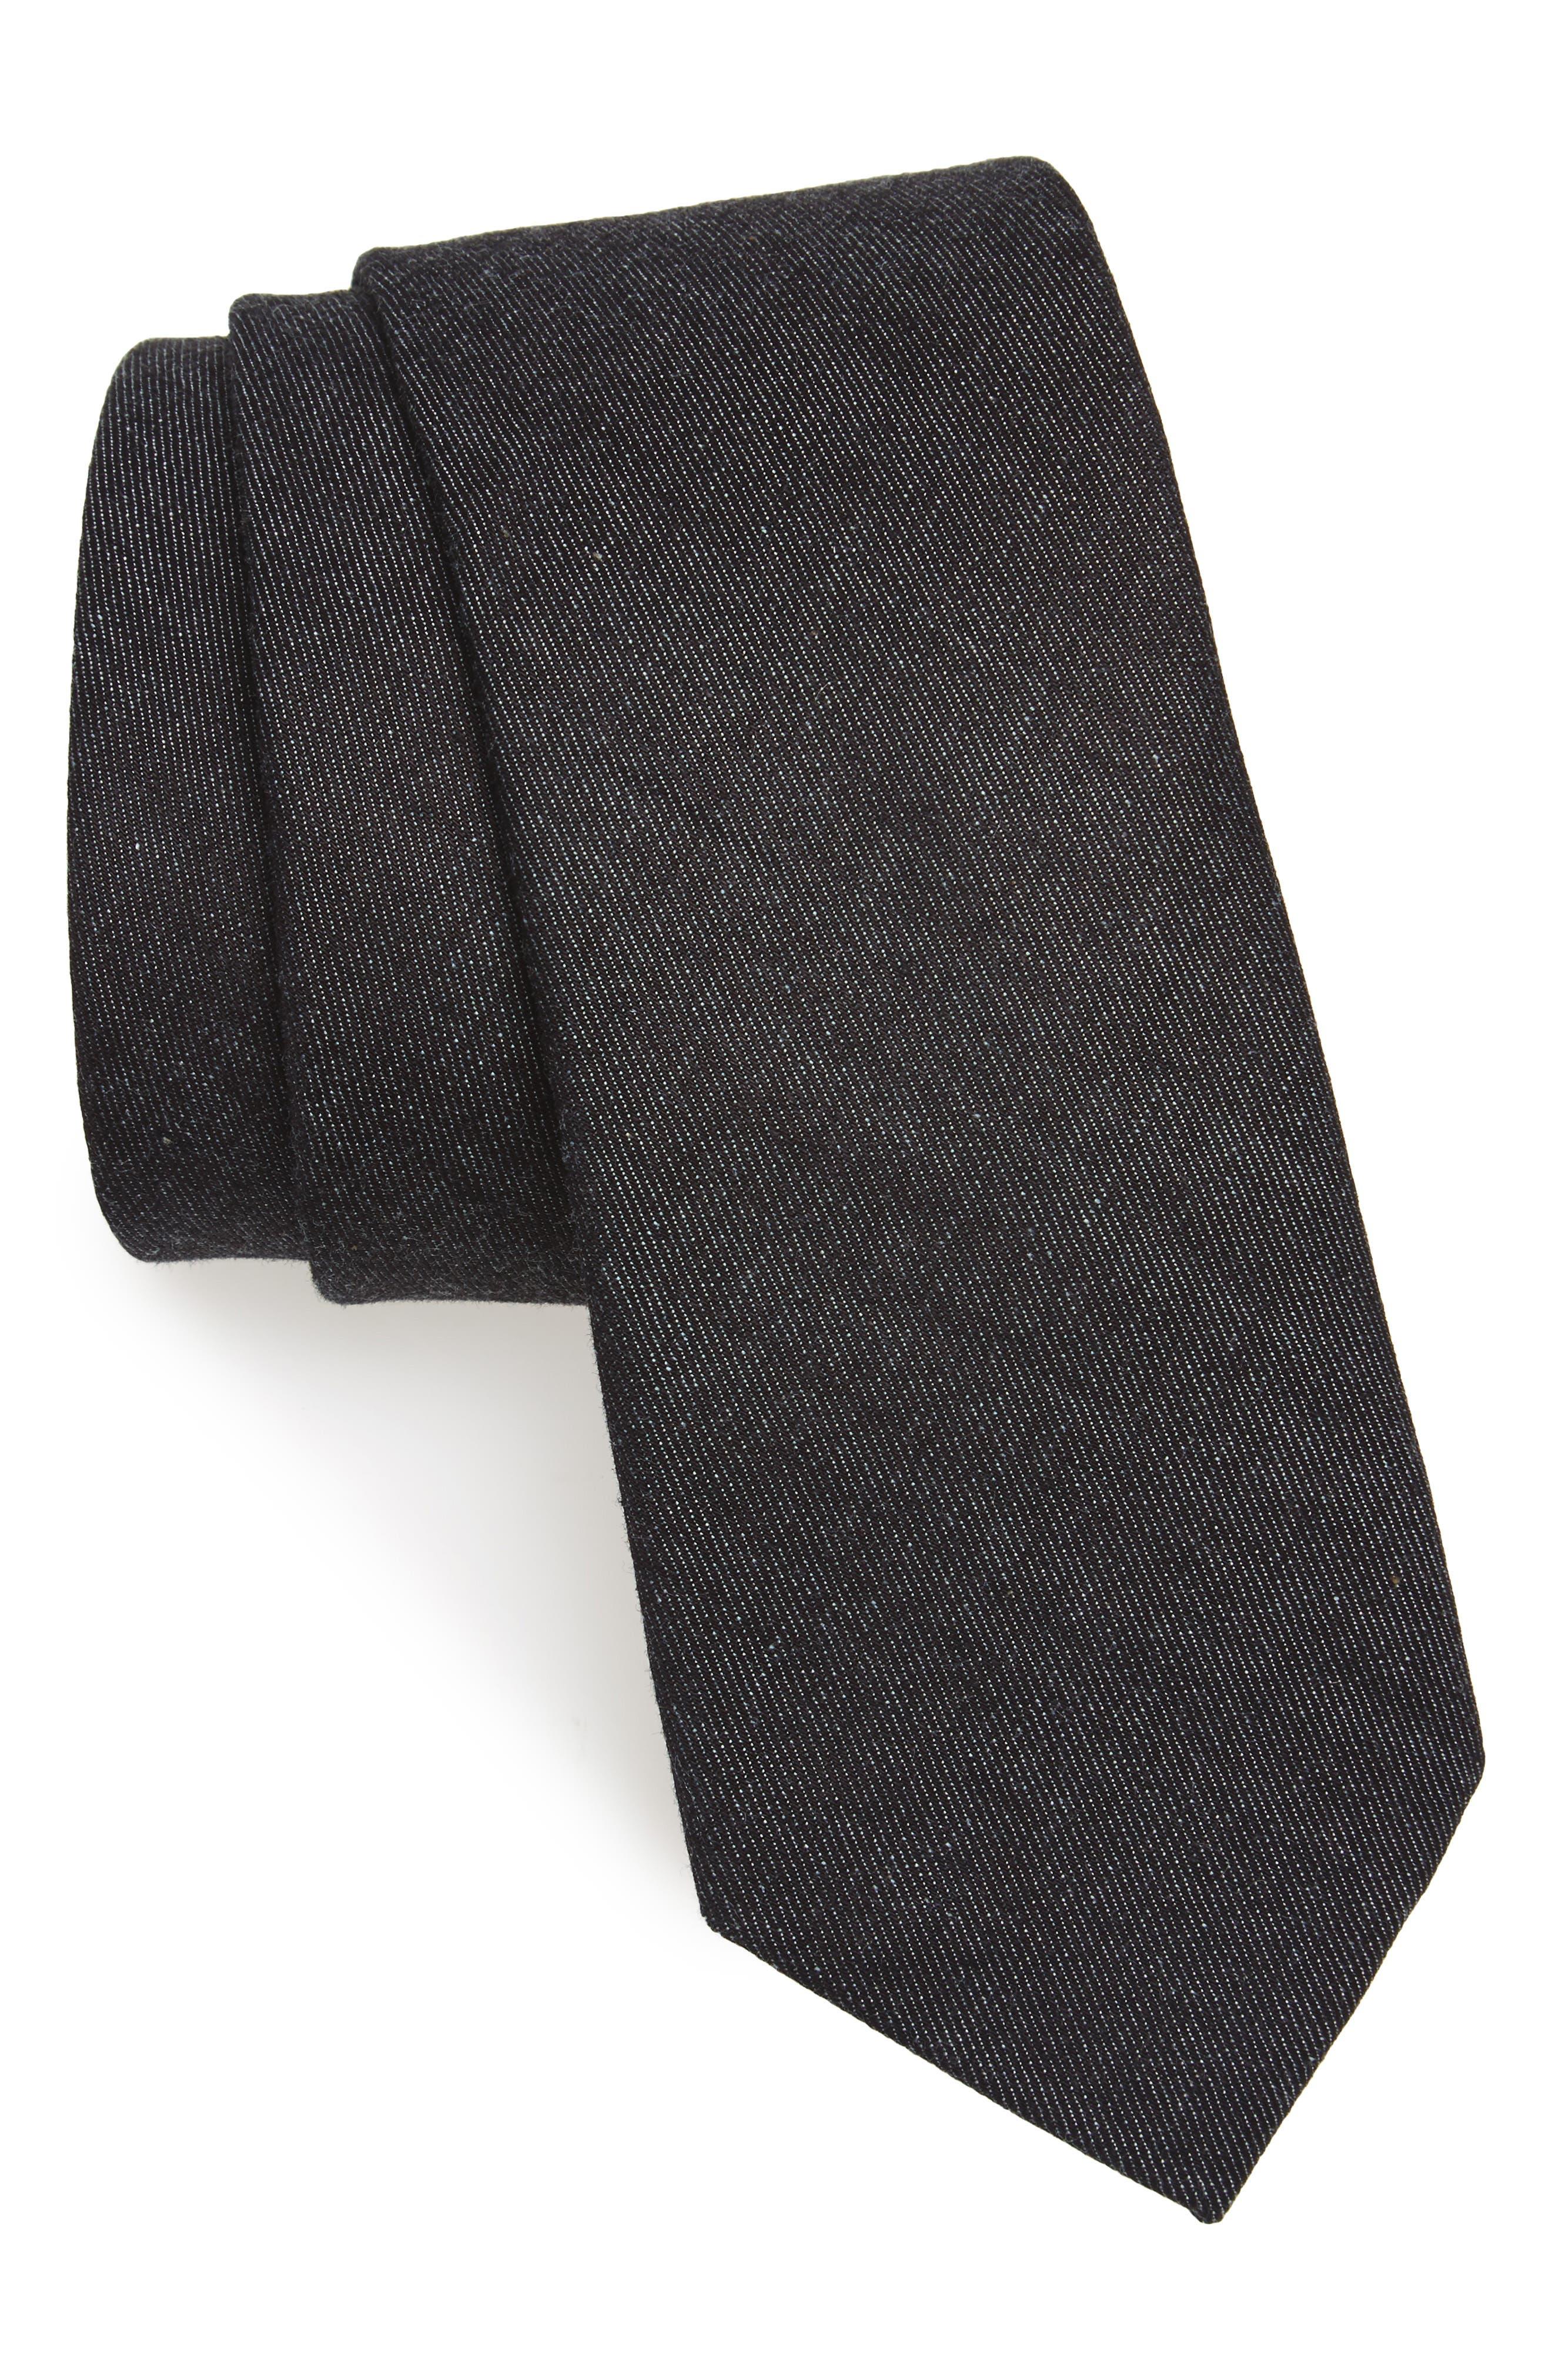 Bartlett Solid Cotton Tie,                         Main,                         color, Black